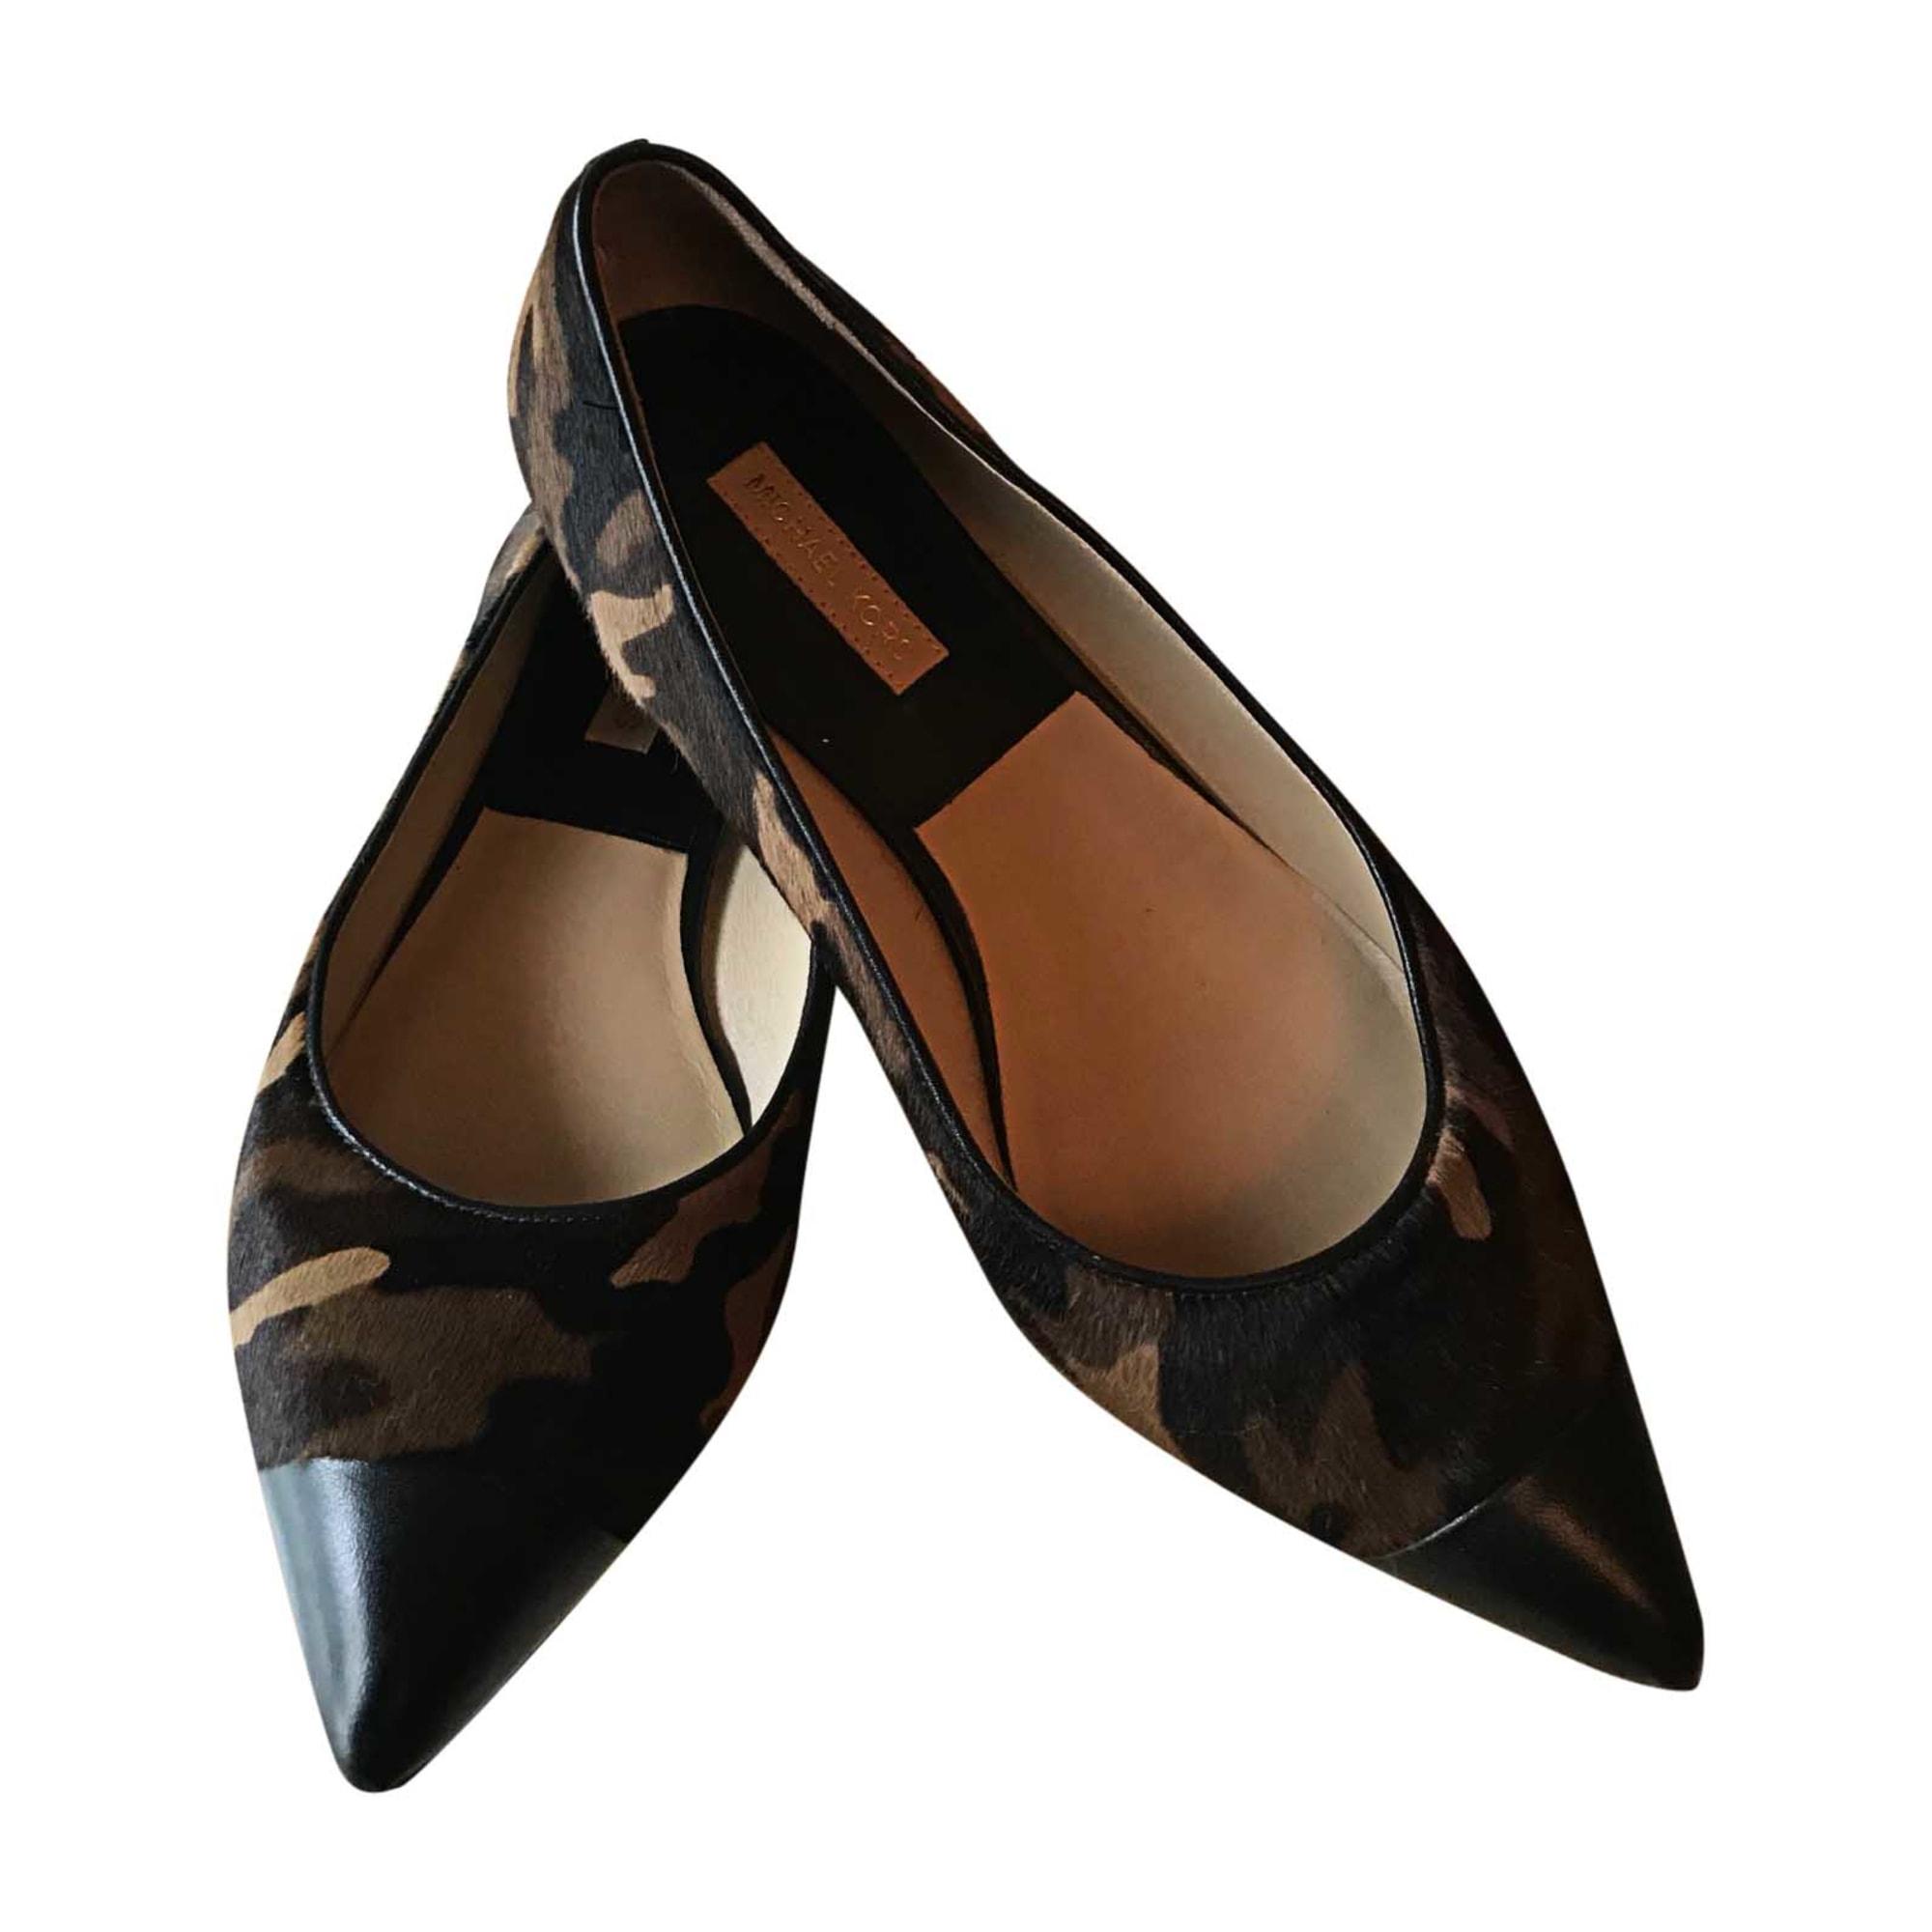 Ballet Flats MICHAEL KORS Camouflage marron noir